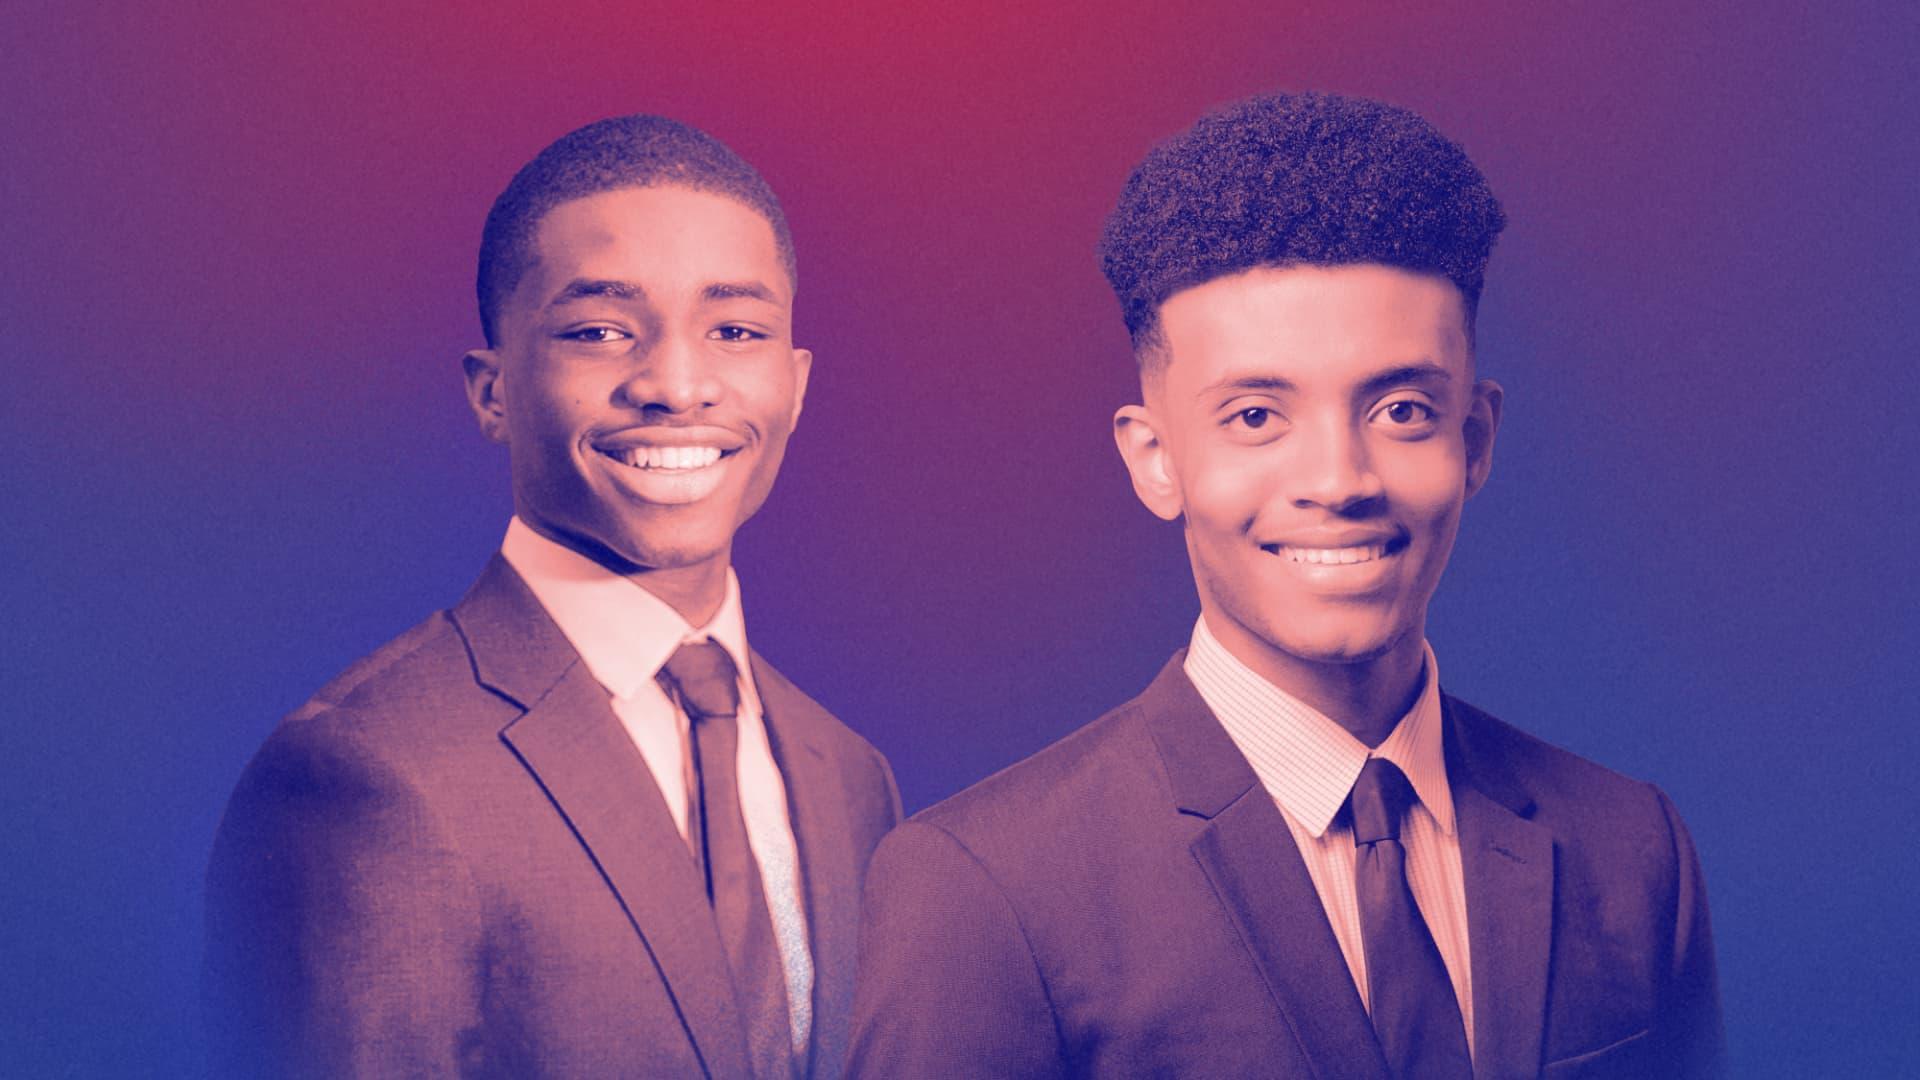 Cheick Camara and Ermias Tadesse, co-founders of BlackGen Capital.